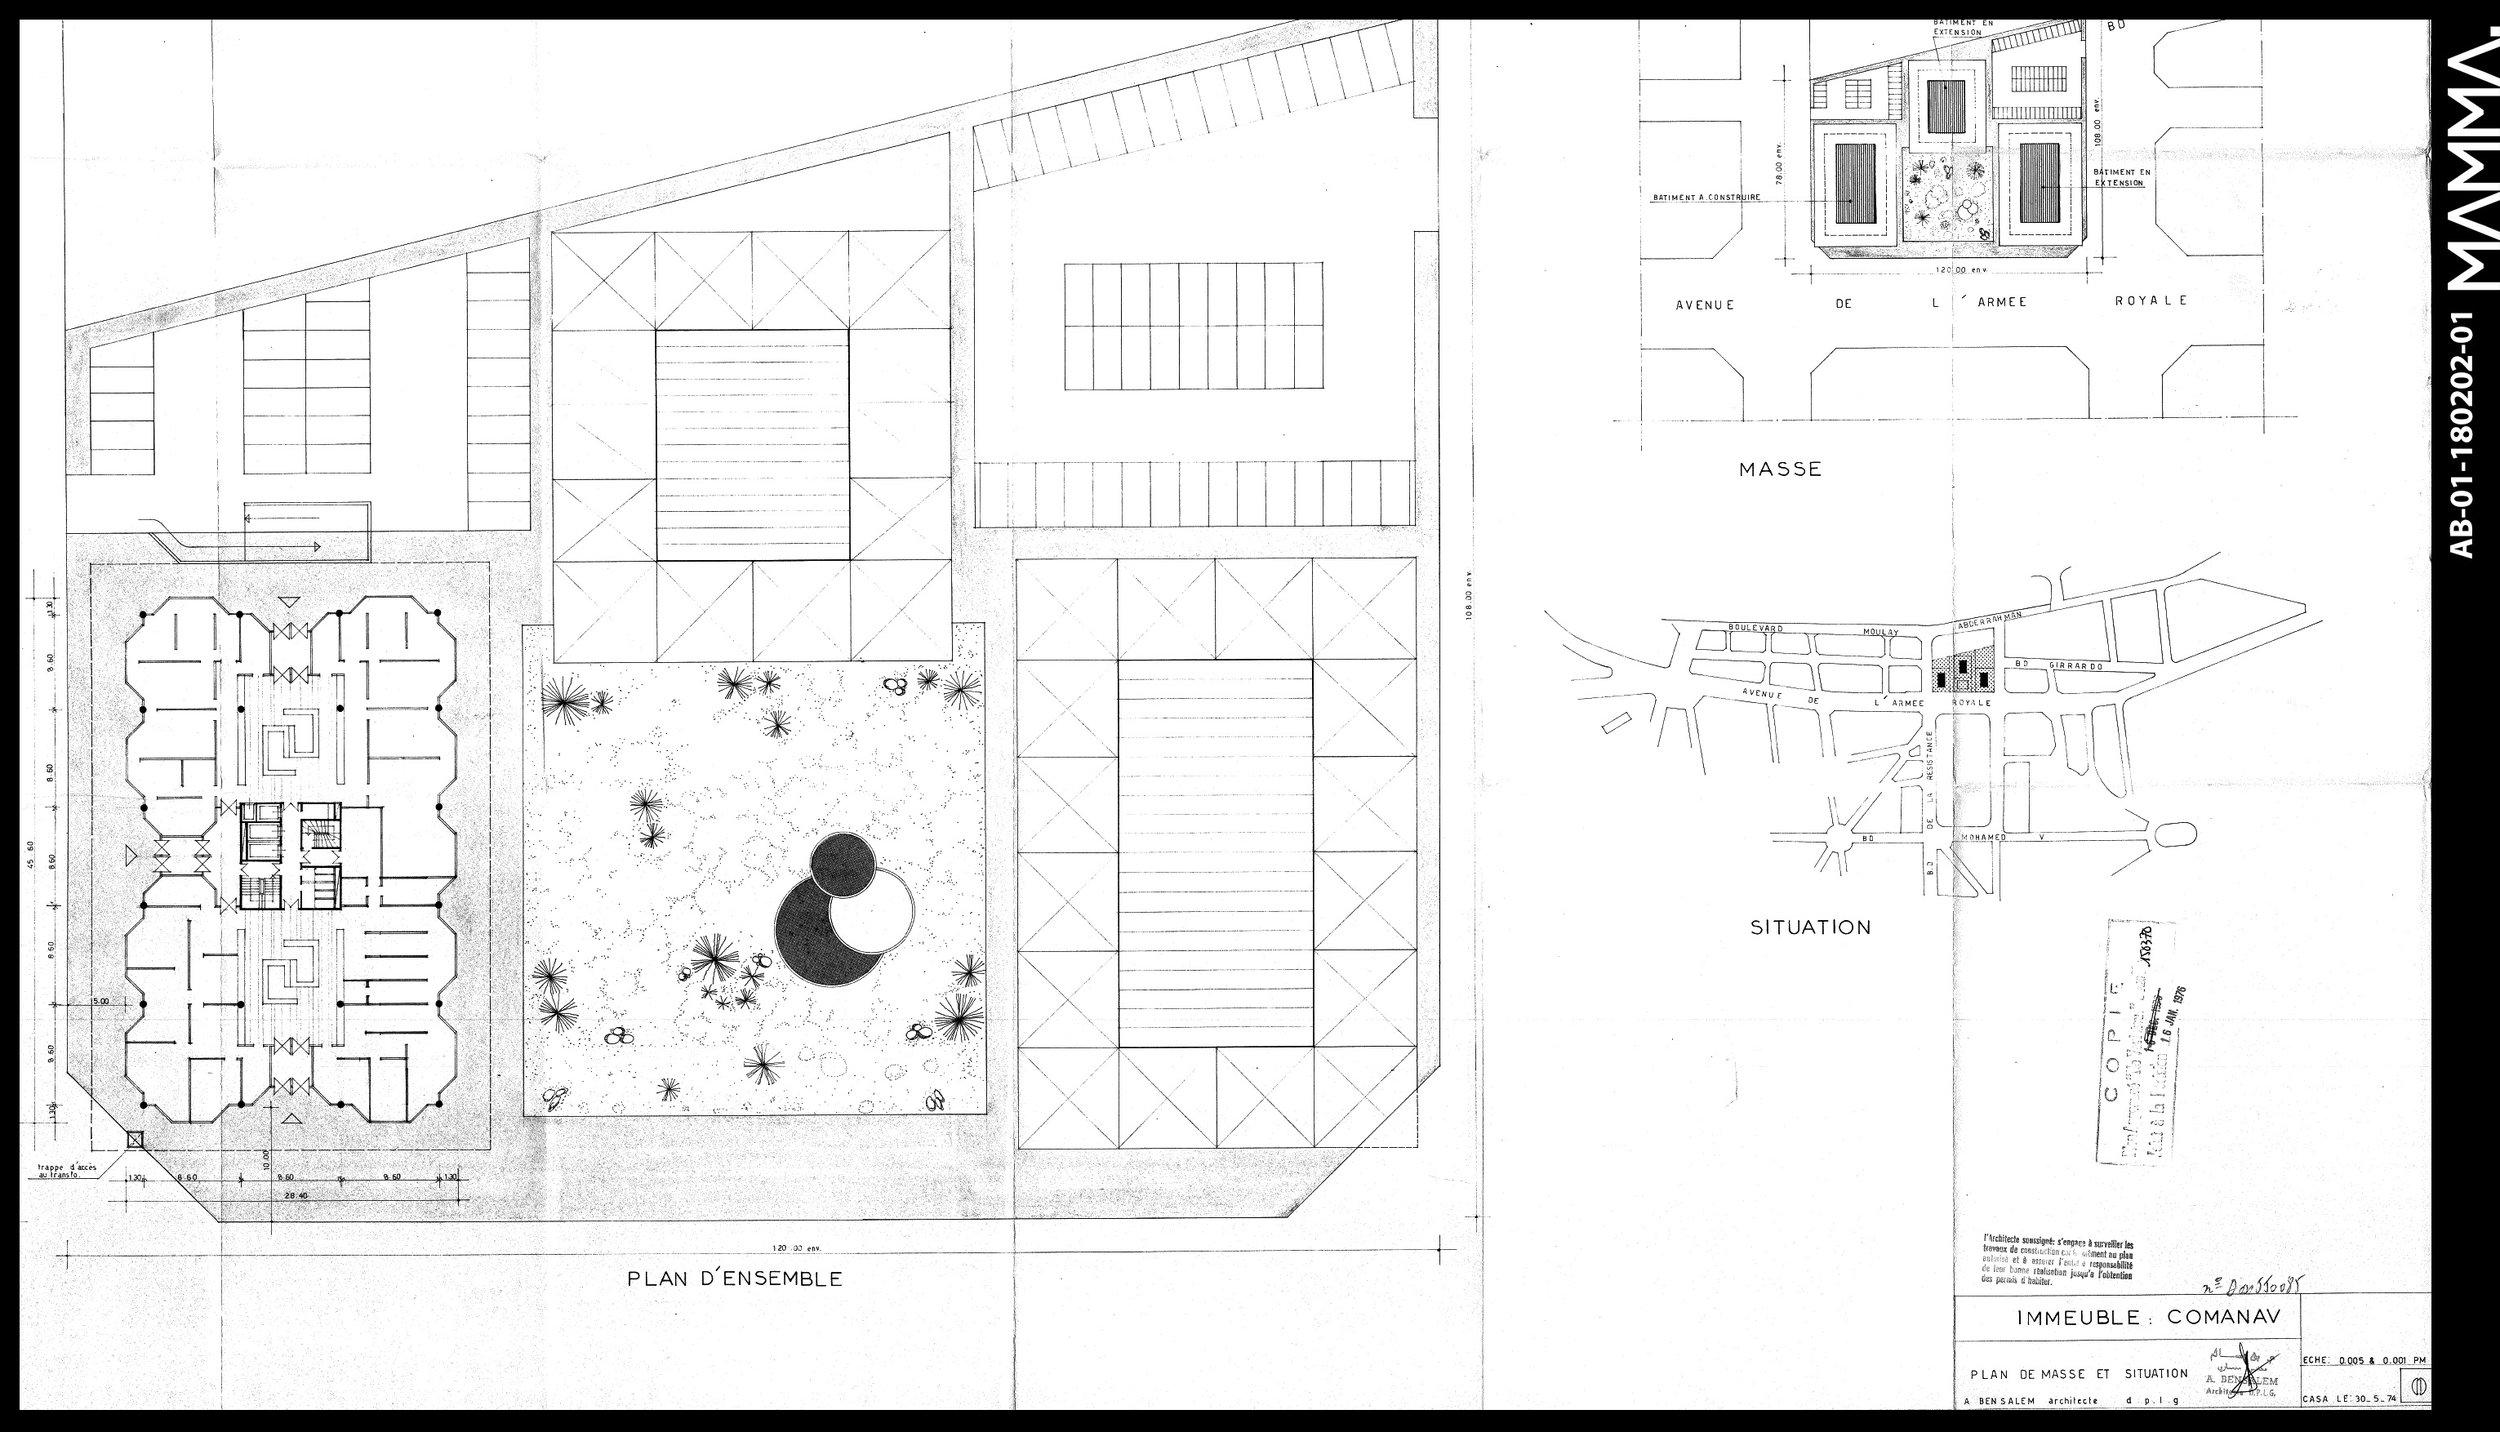 1974-La COMANAV   Agence: Abdelkader Abdeslem  Contenu: Plan de situation, plan masse, plan RDC  Dimensions: 106,95 x 77 cm      © MAMMAARCHIVE   Réf: MAMMA- AB-01-180202-01